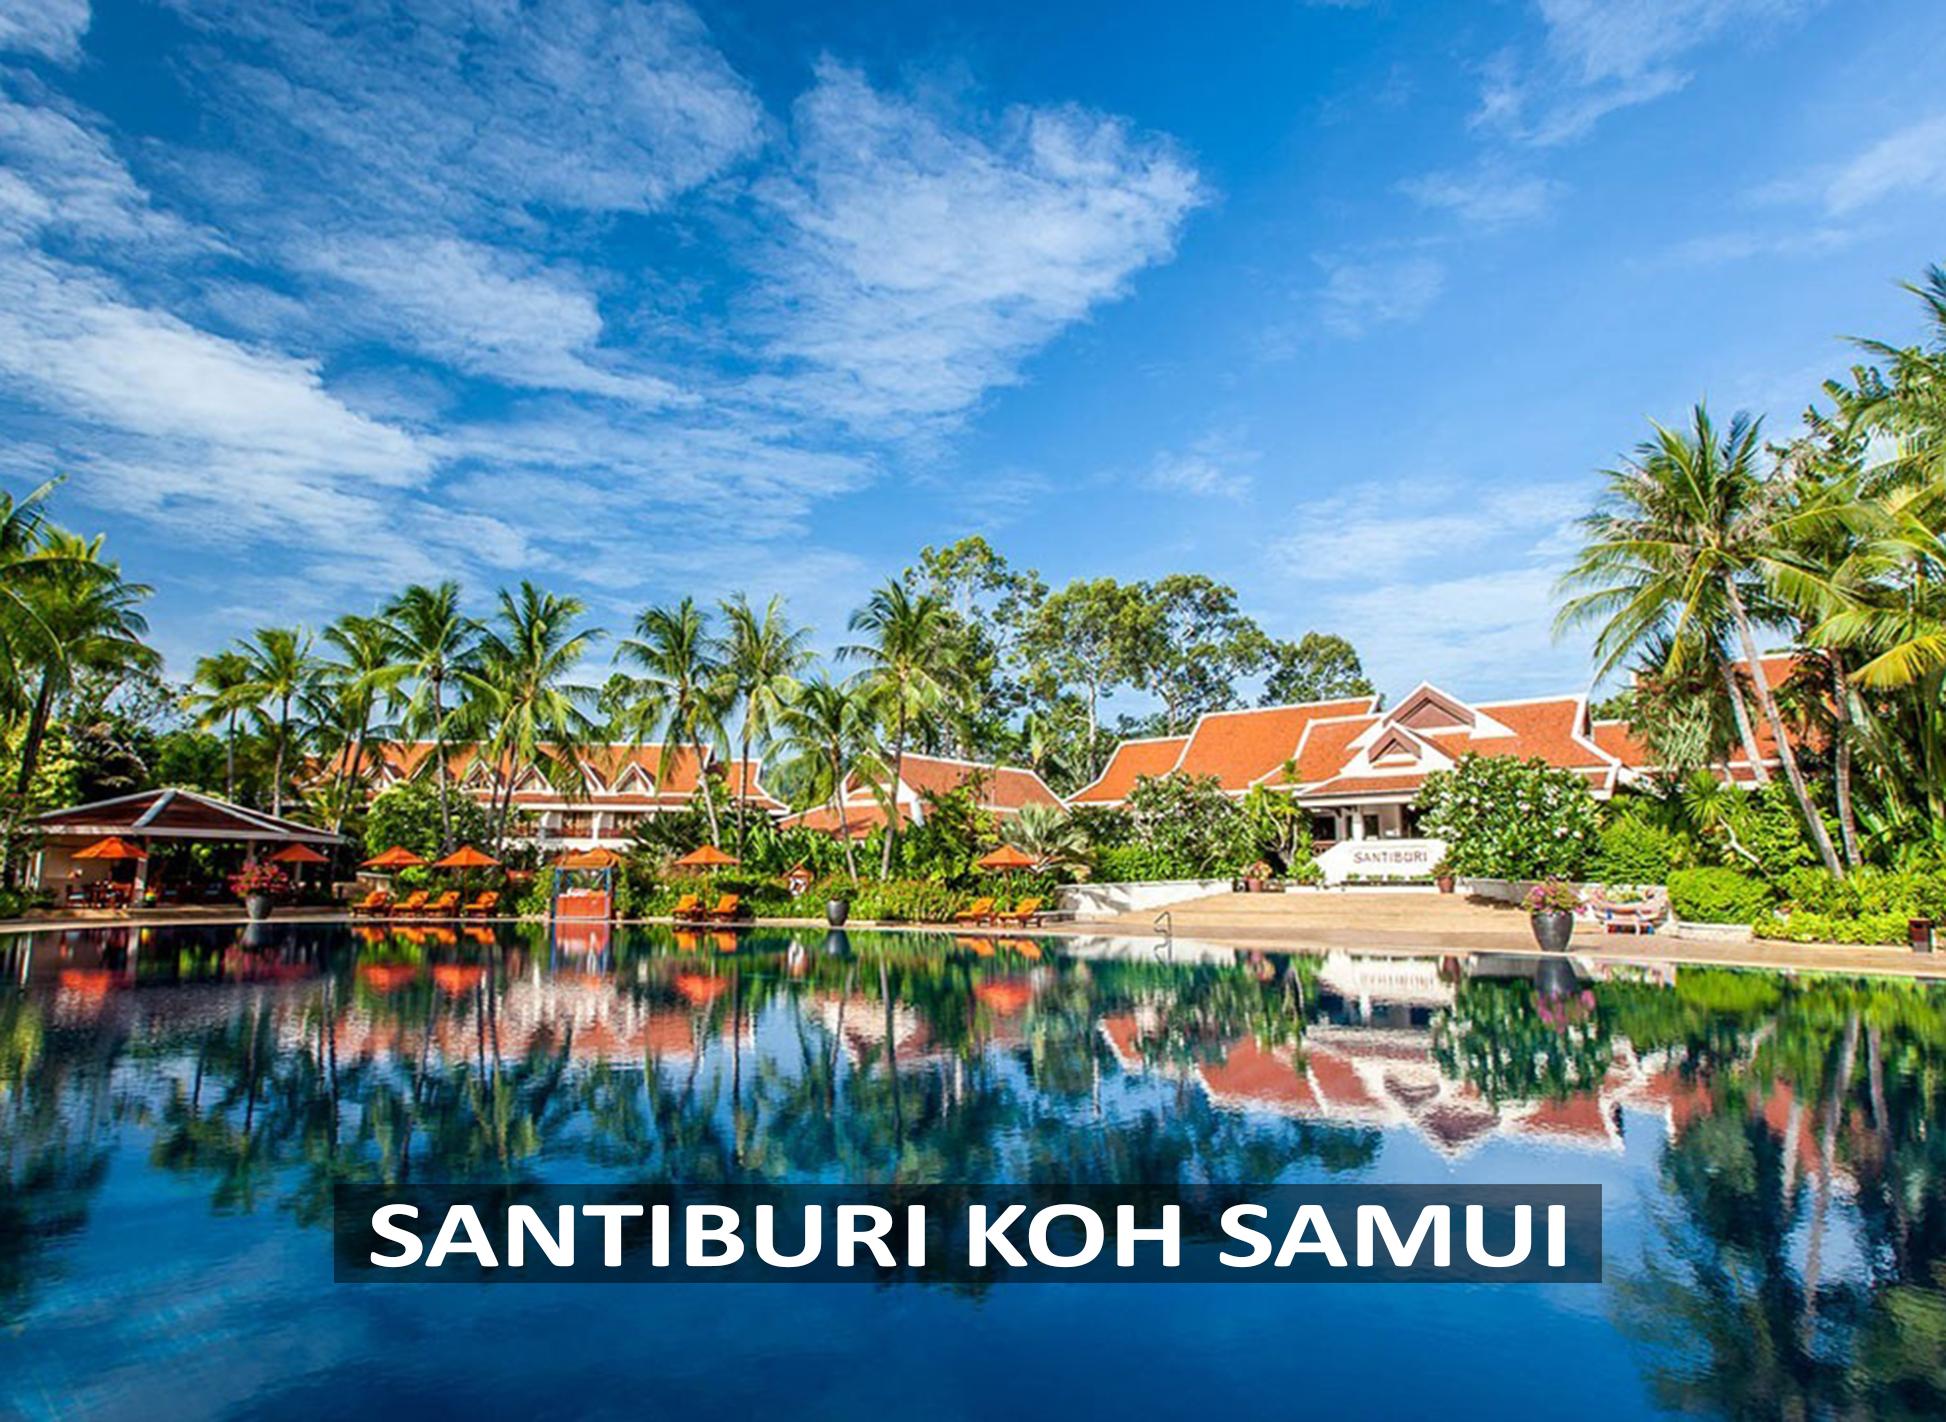 Santiburi icon